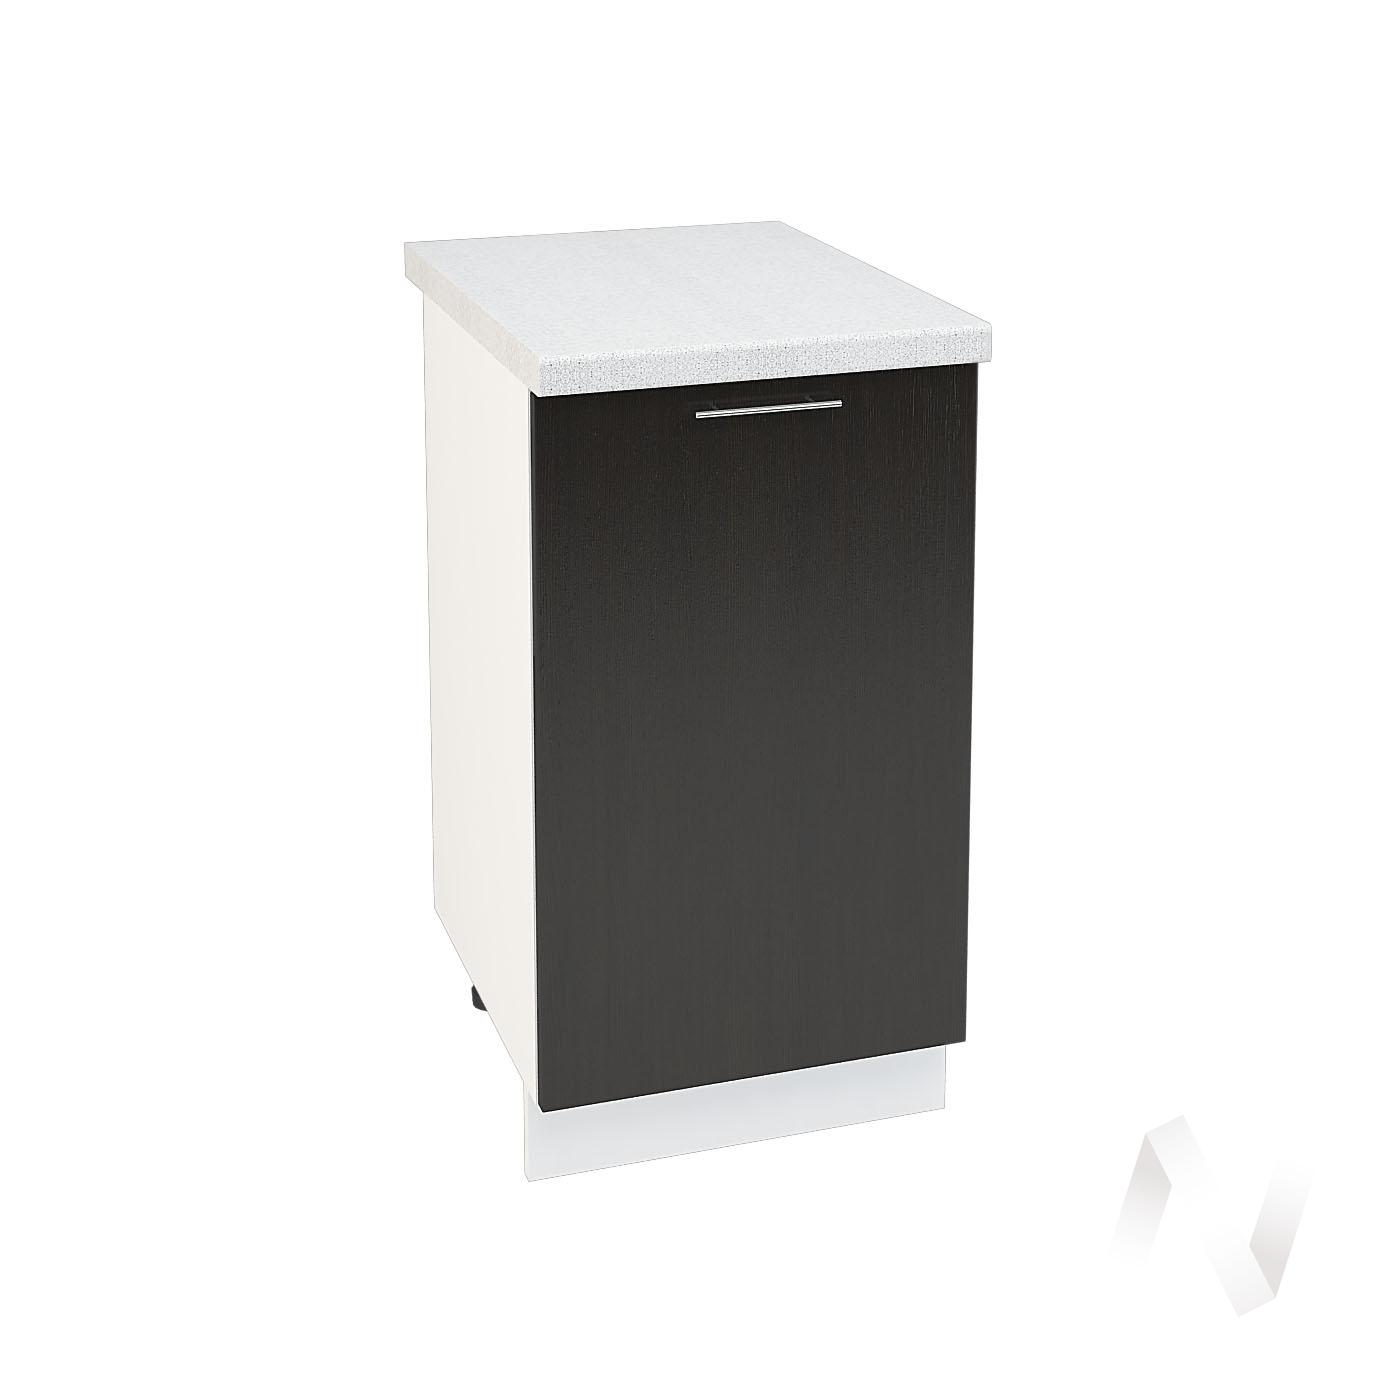 "Кухня ""Валерия-М"": Шкаф нижний 450, ШН 450 (венге/корпус белый)"